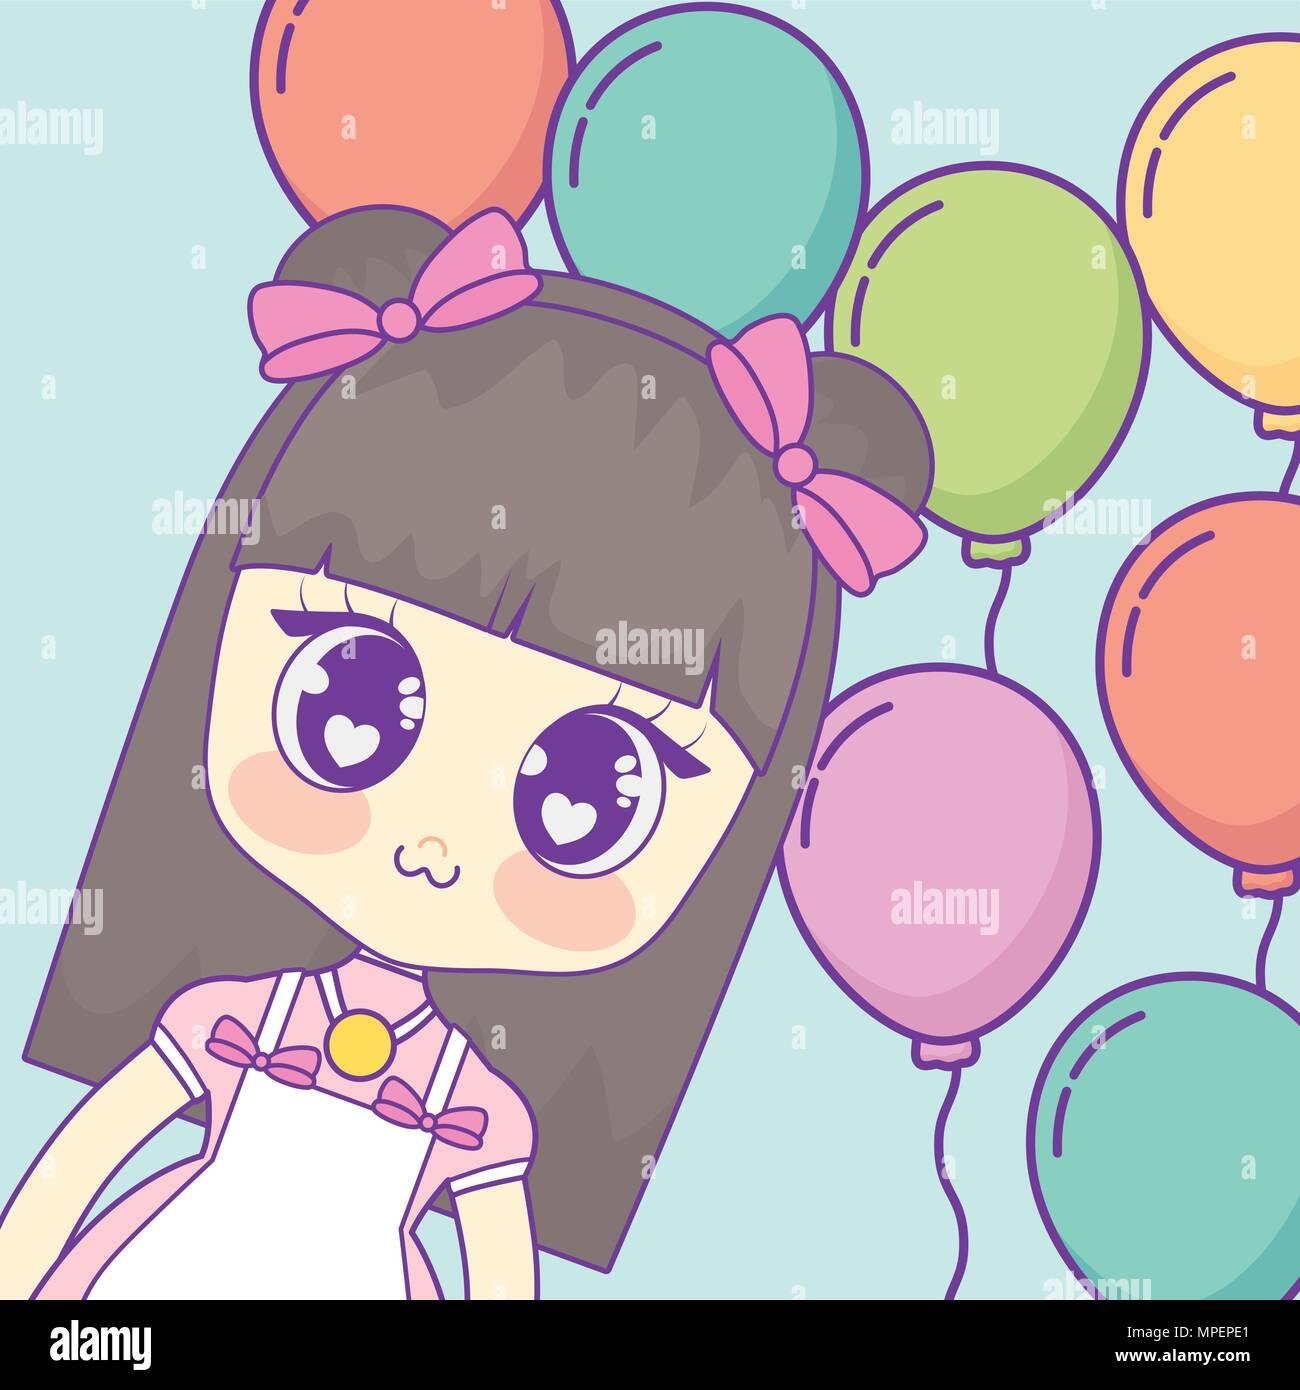 a26261105 Kawaii anime chica en globos de colores y fondo azul